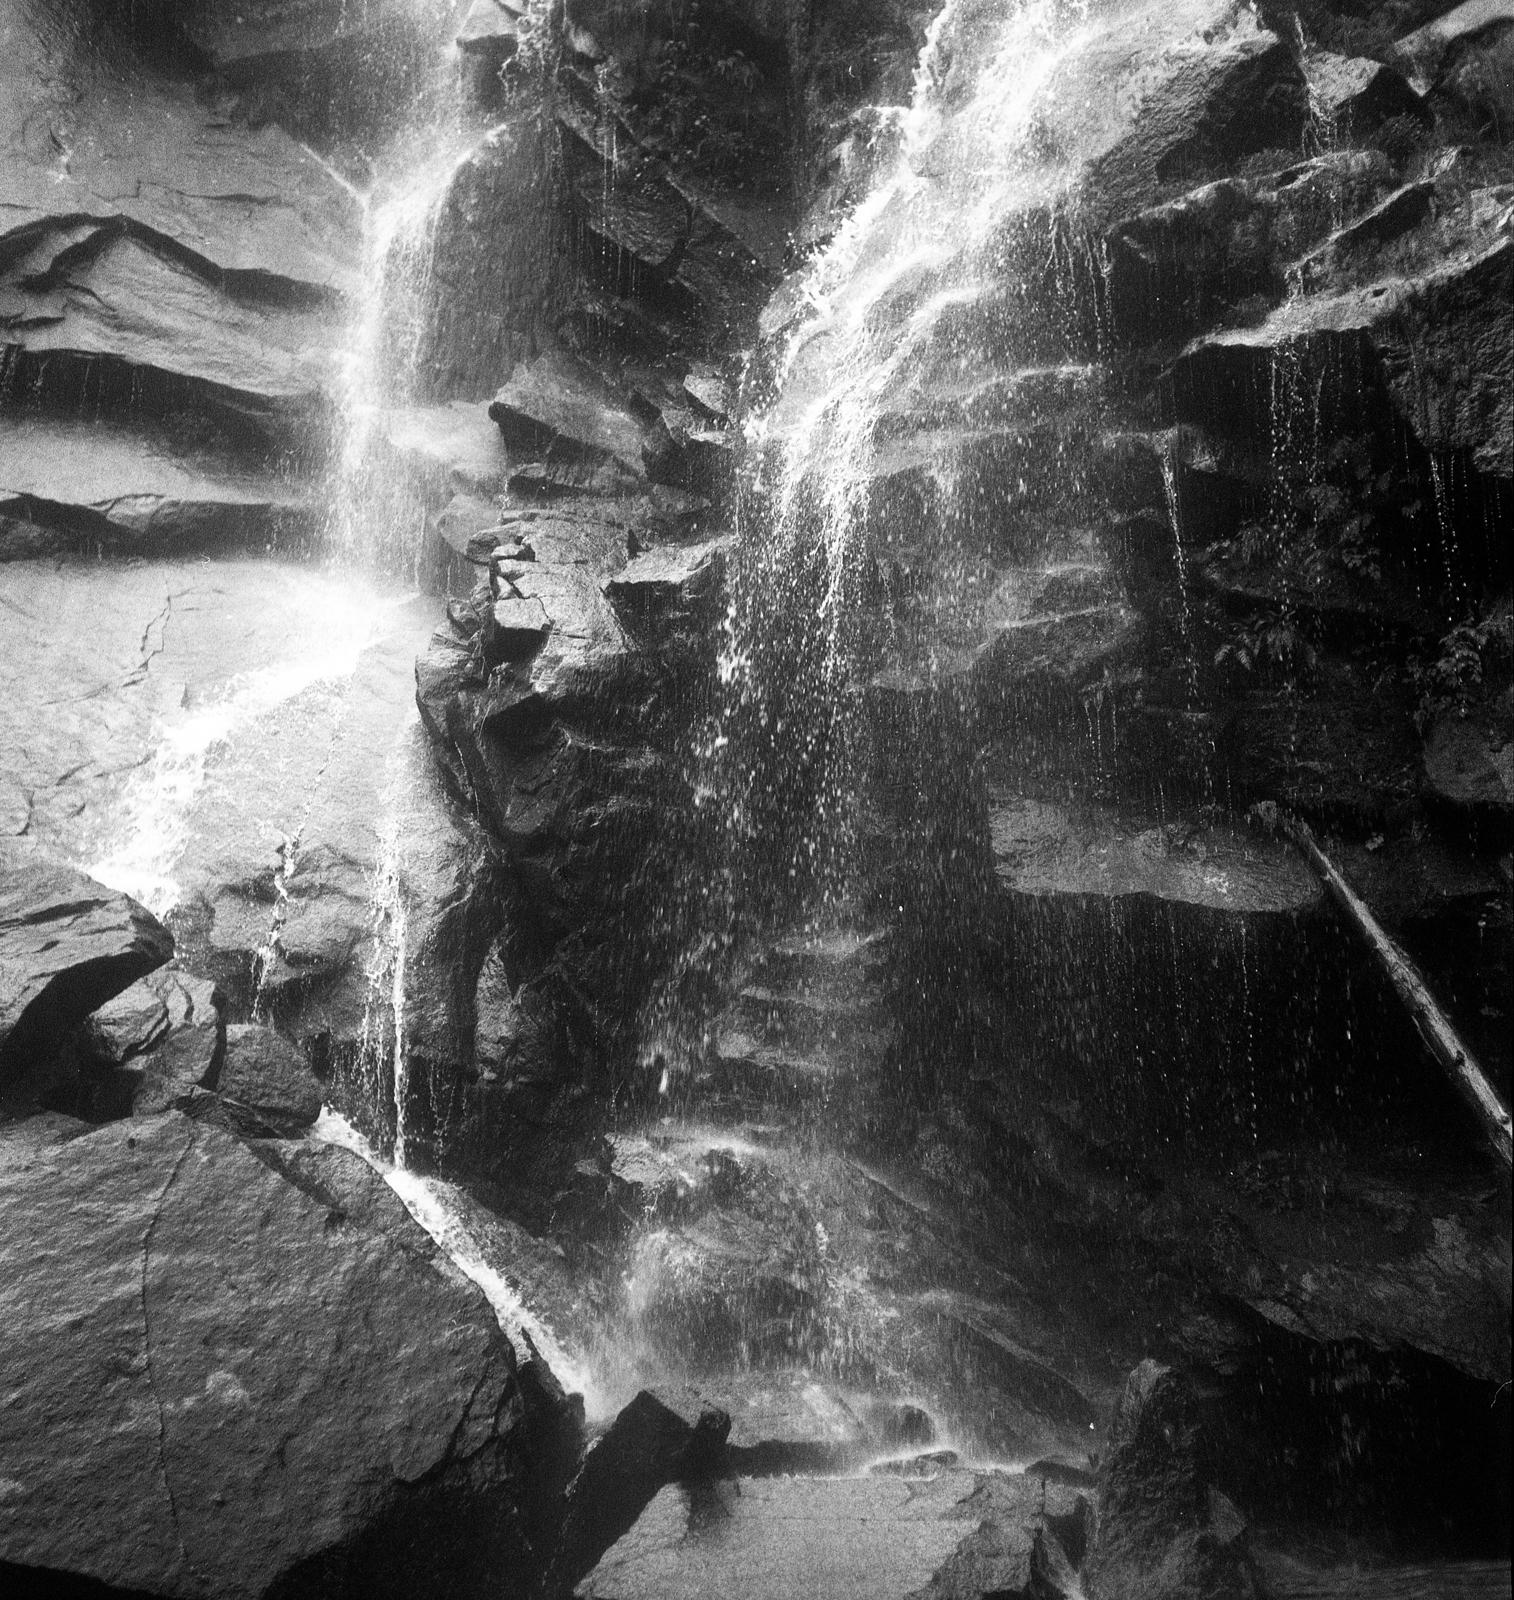 Waterfall. ~2012.